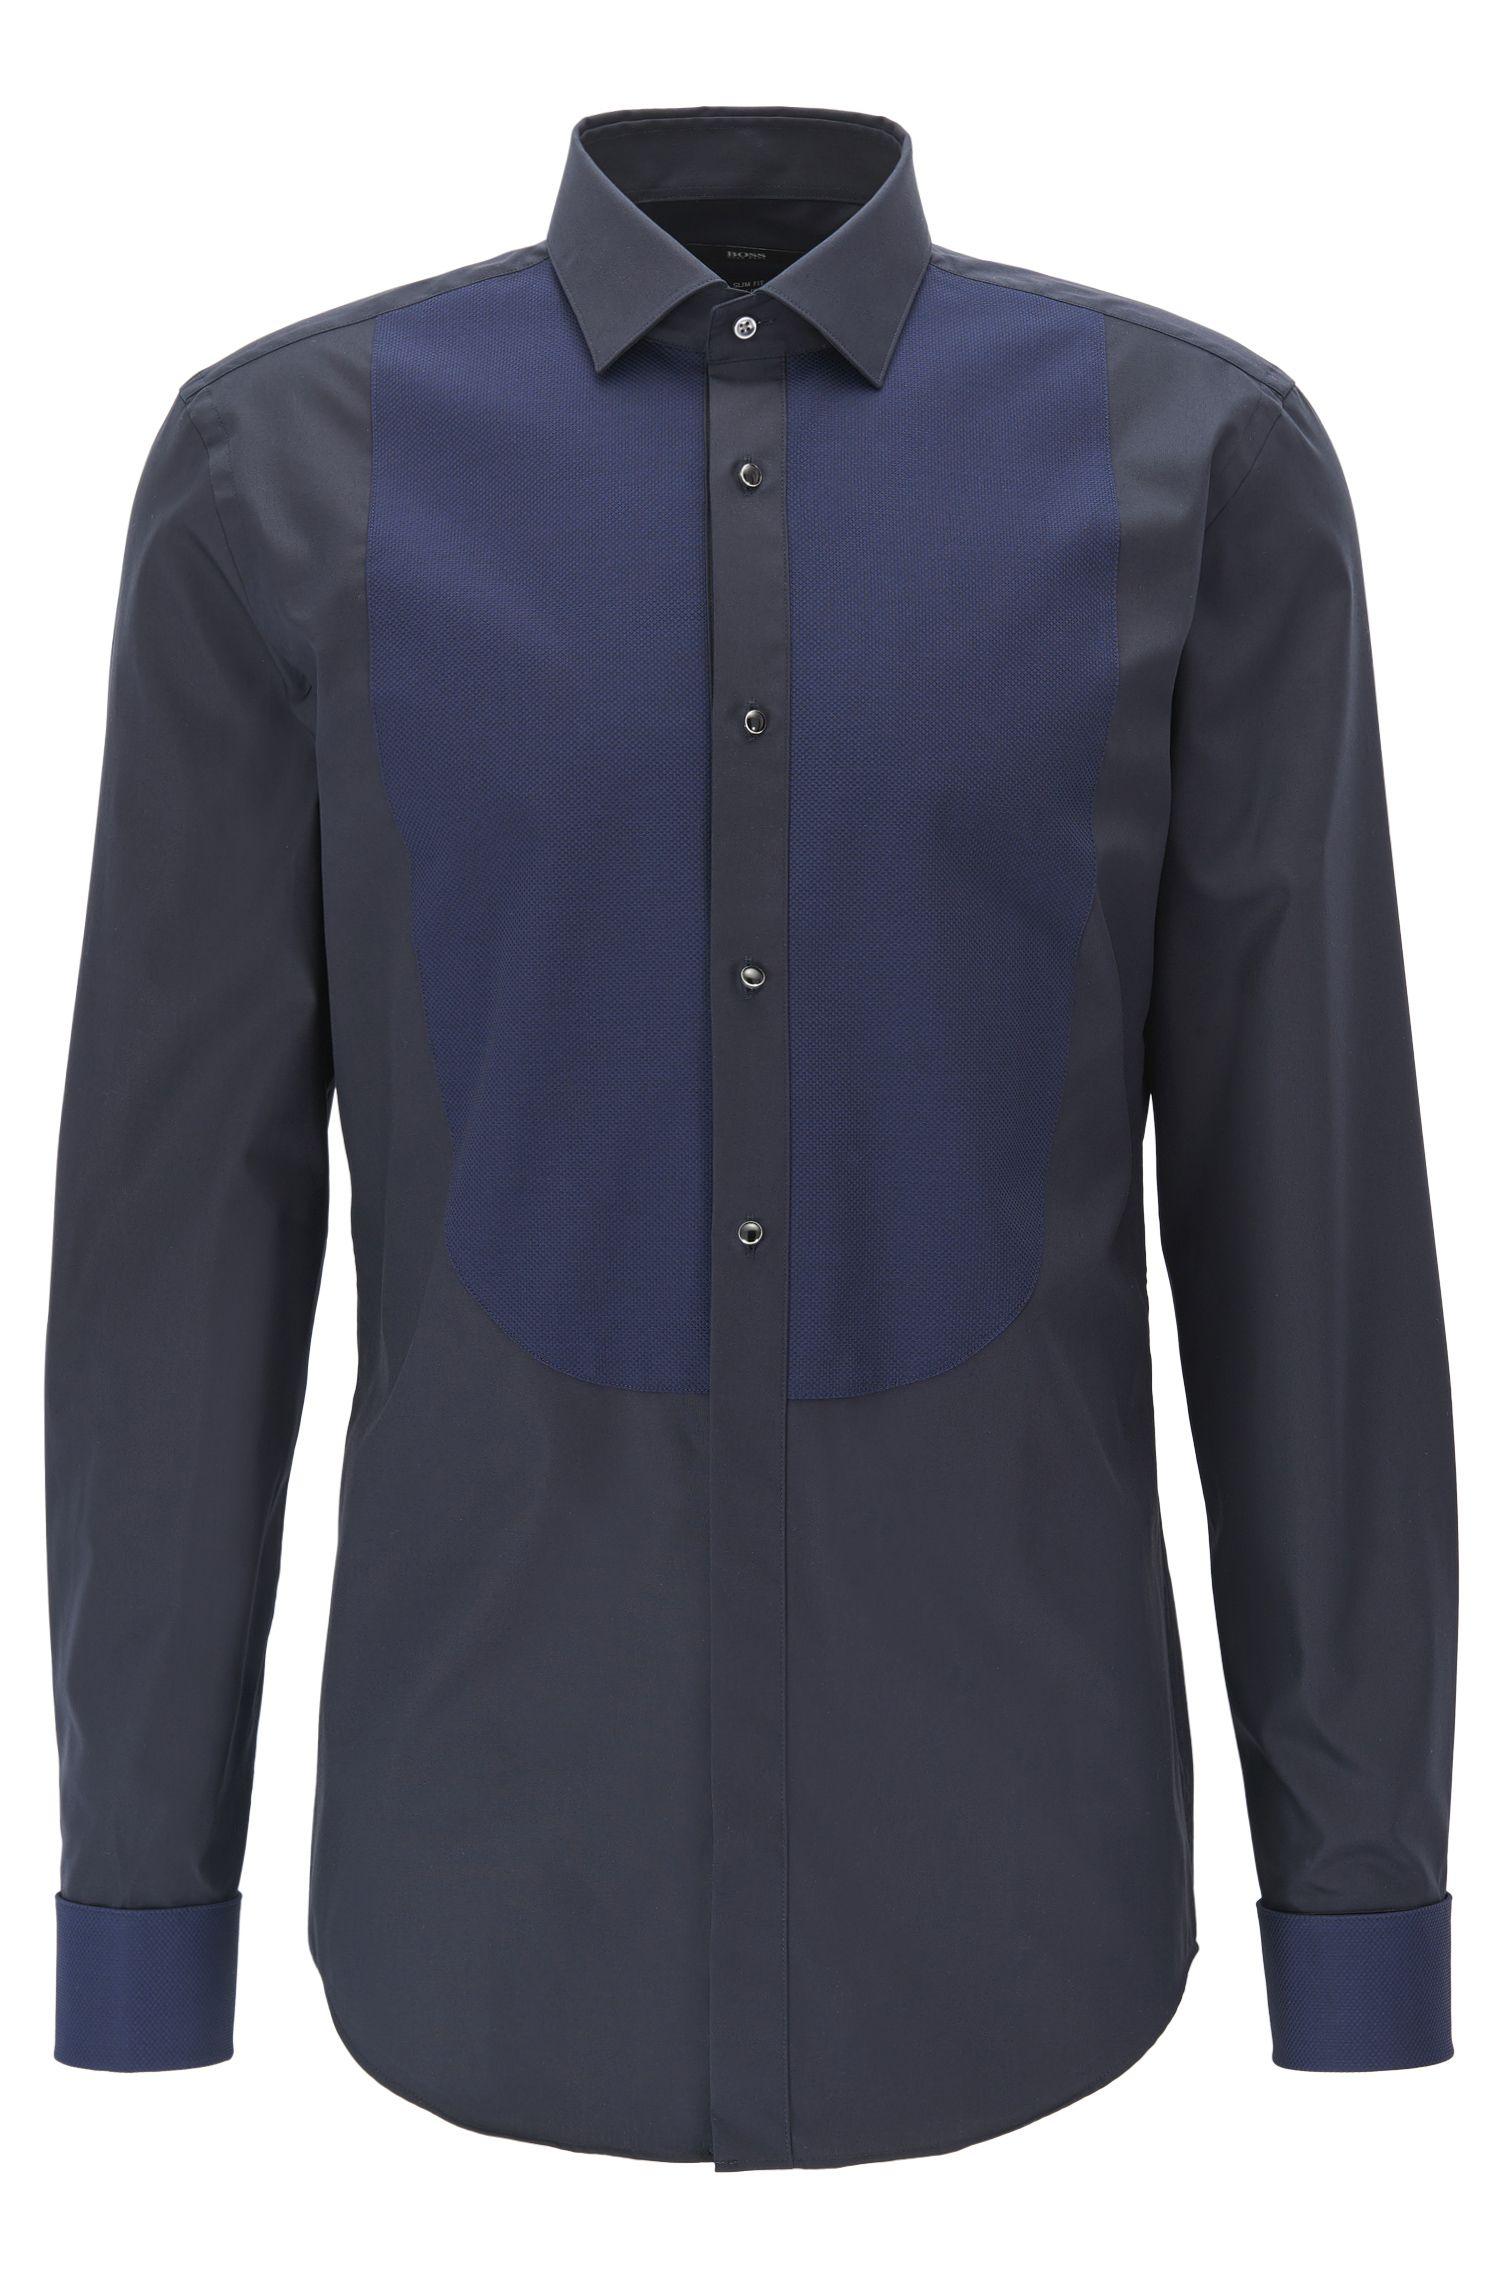 Two-Tone Tuxedo Shirt, Slim Fit | Jant